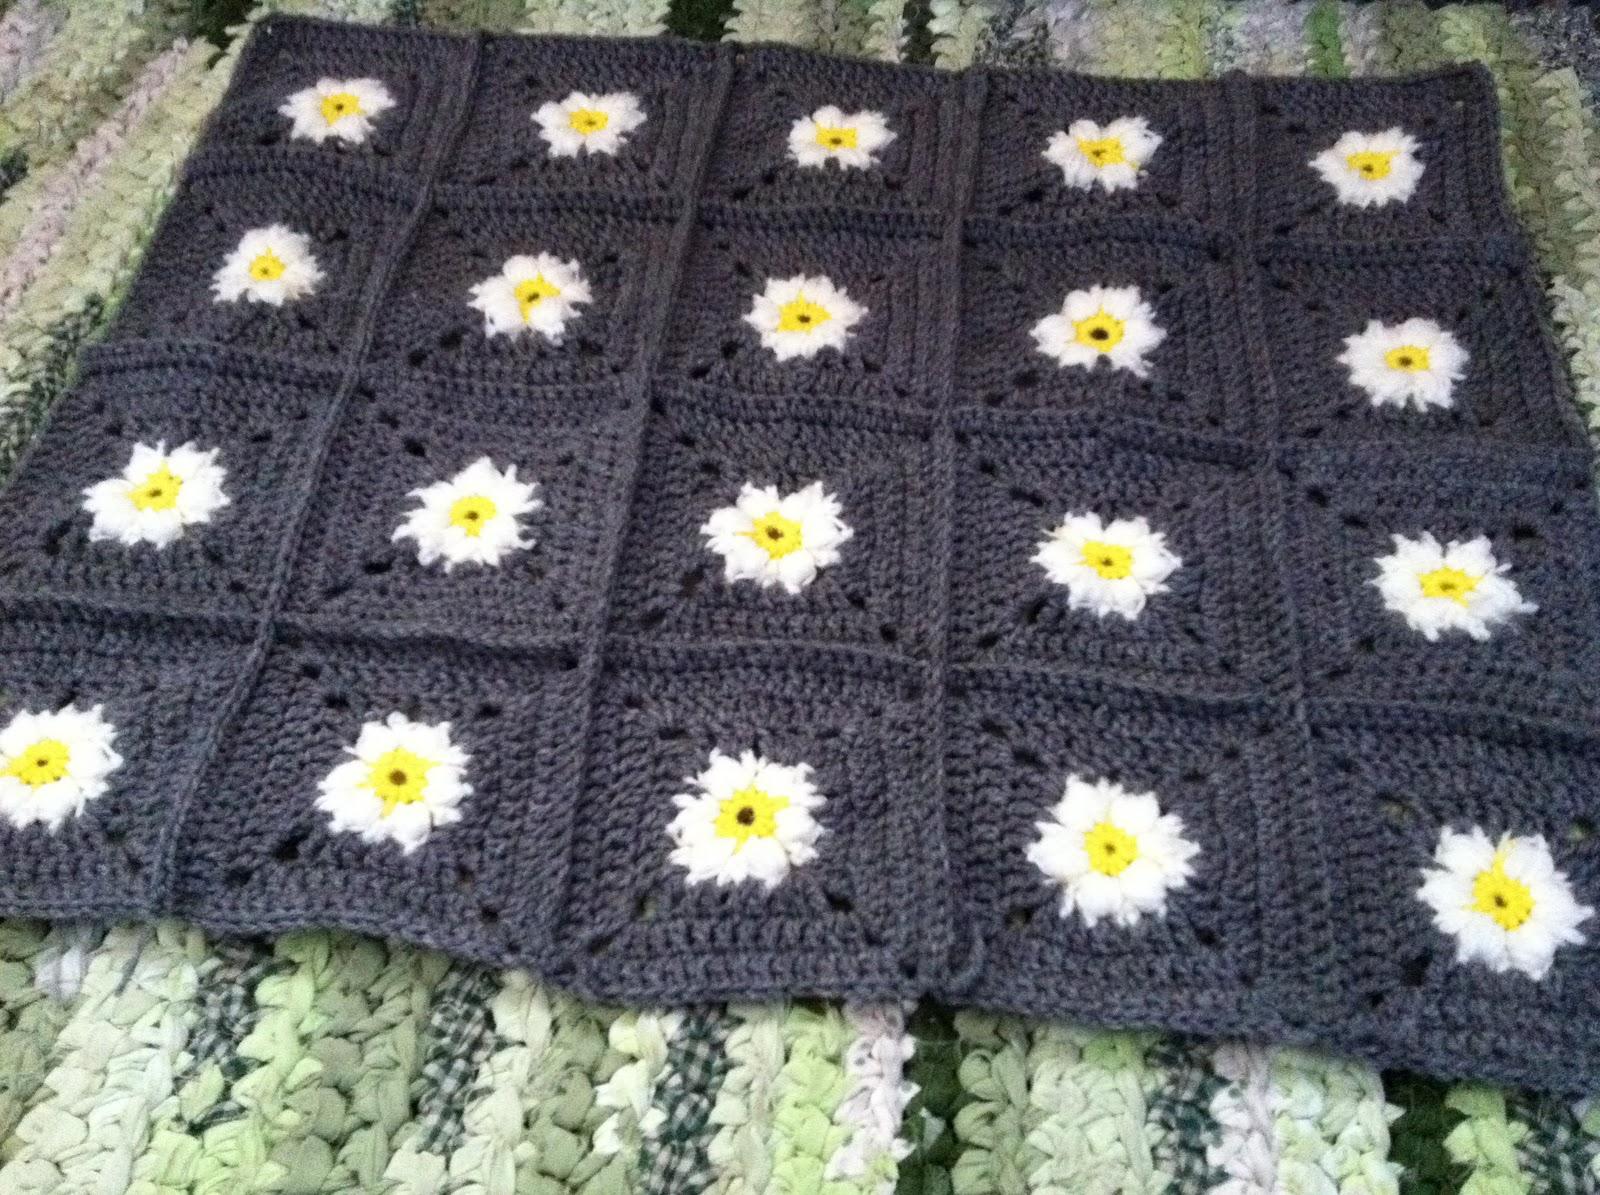 Free Crochet Pattern For Daisy Blanket : Design Adventures: Daisy Square Blanket